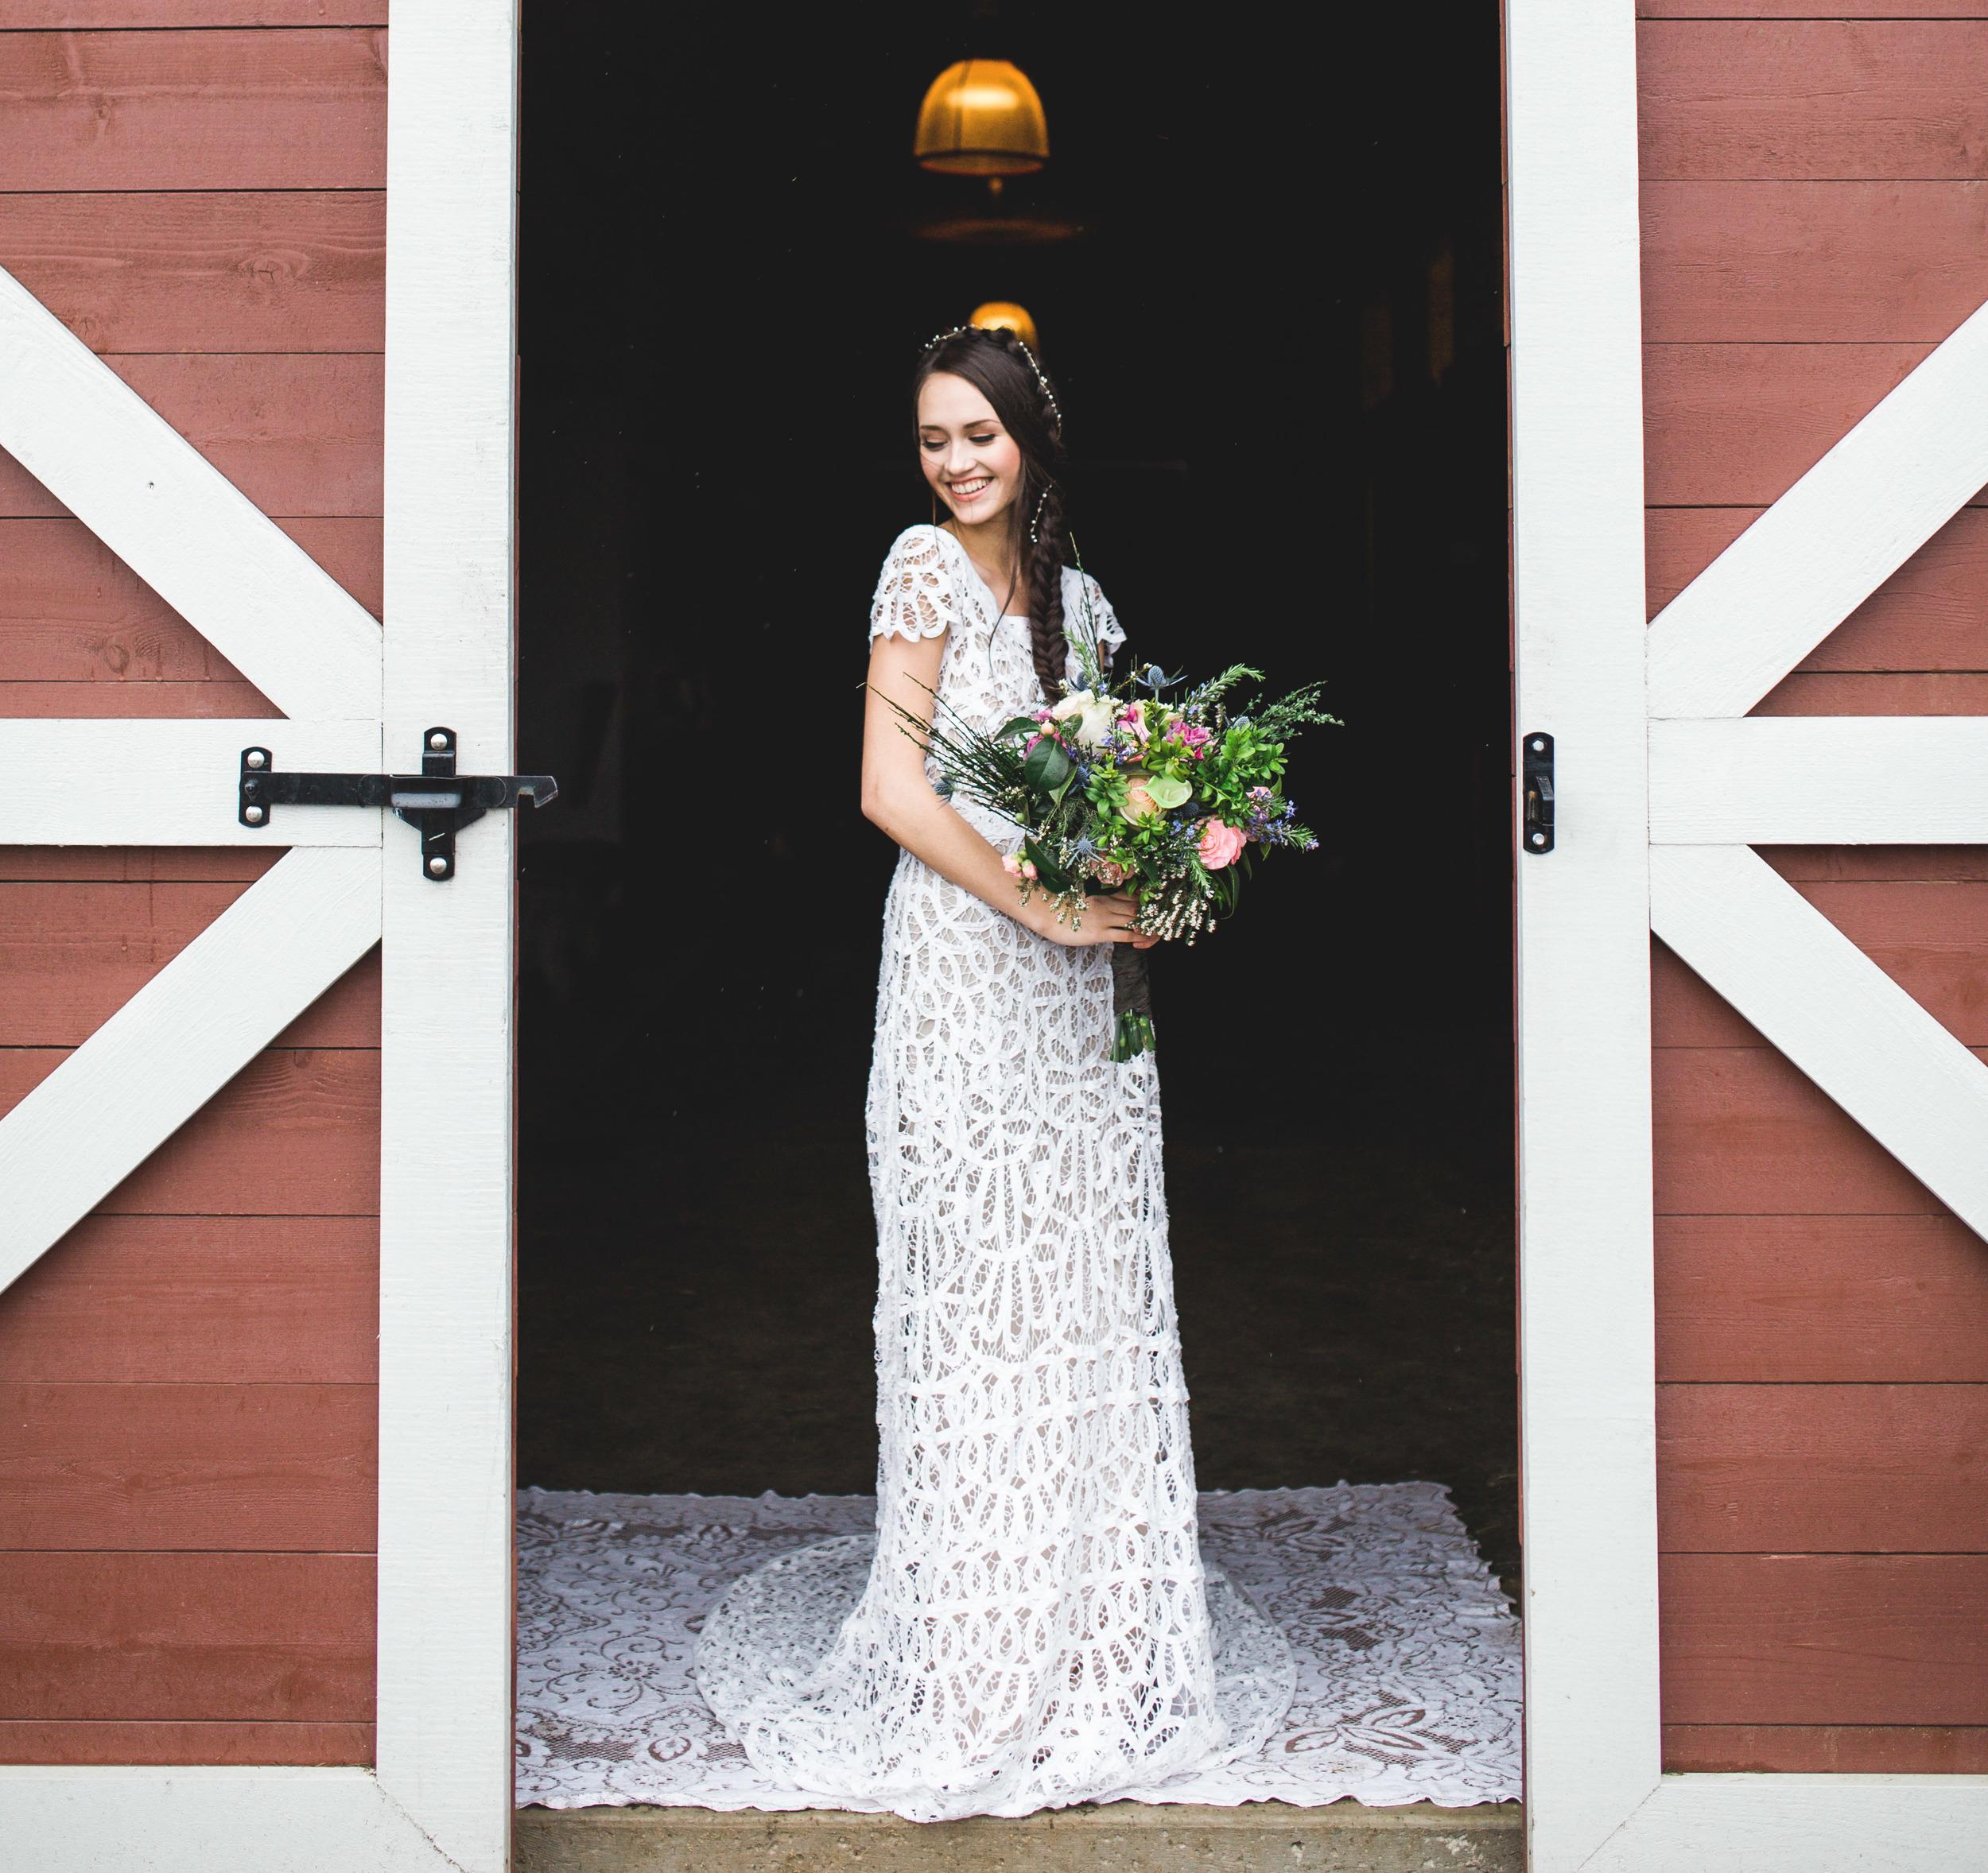 IMG_0144 VANCOUVER WEDDING PHOTOGRAPHER JENNIFER PICARD PHOTOGRAPHY.jpg